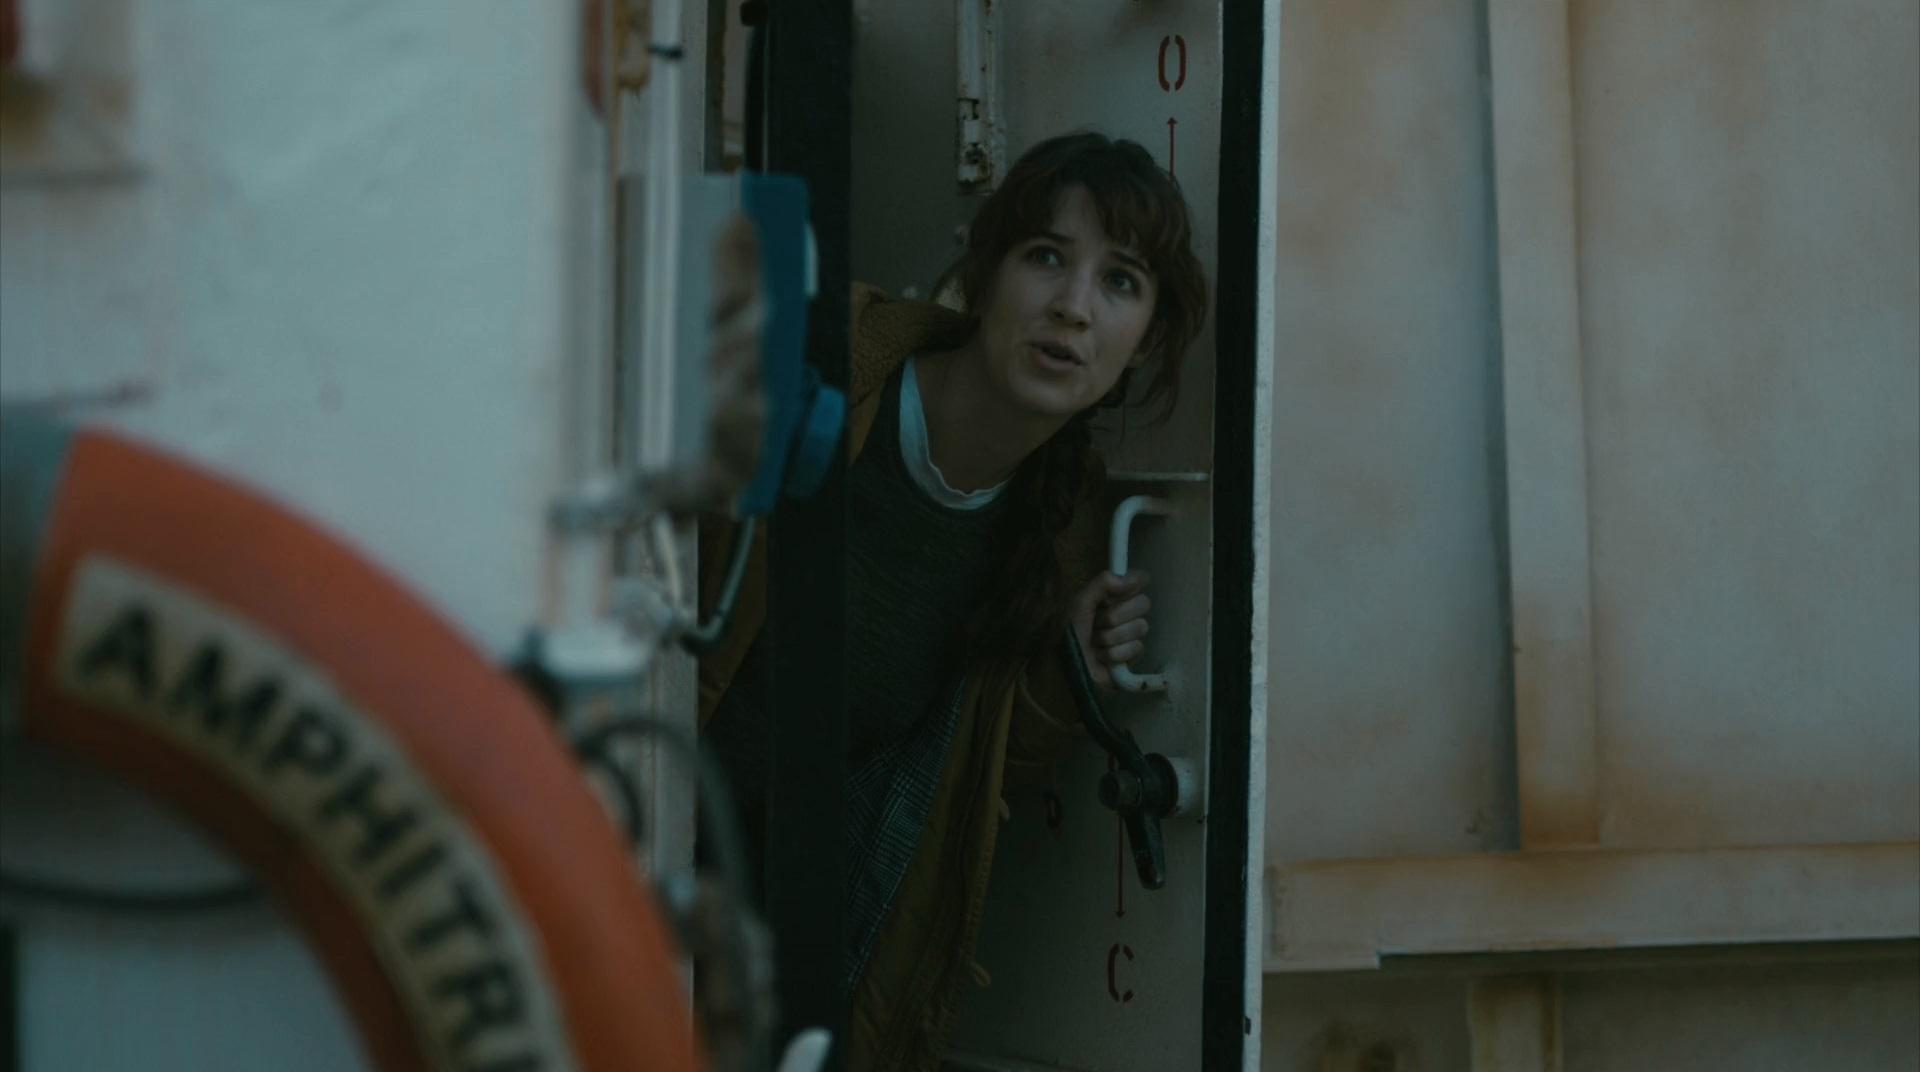 Suda Ölüm   Dead in the Water   2018   WEB-DL   XviD   Türkçe Dublaj   m720p - m1080p   WEB-DL   Dual   TR-EN   Tek Link